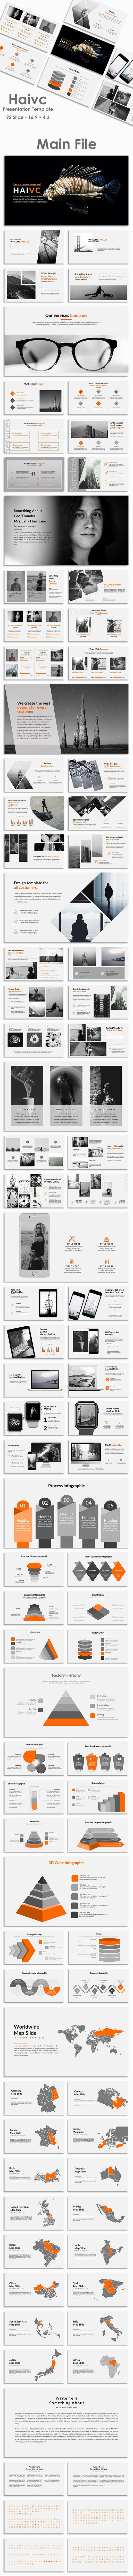 Haivc Multipurpose PowerPoint Template - Creative PowerPoint Templates